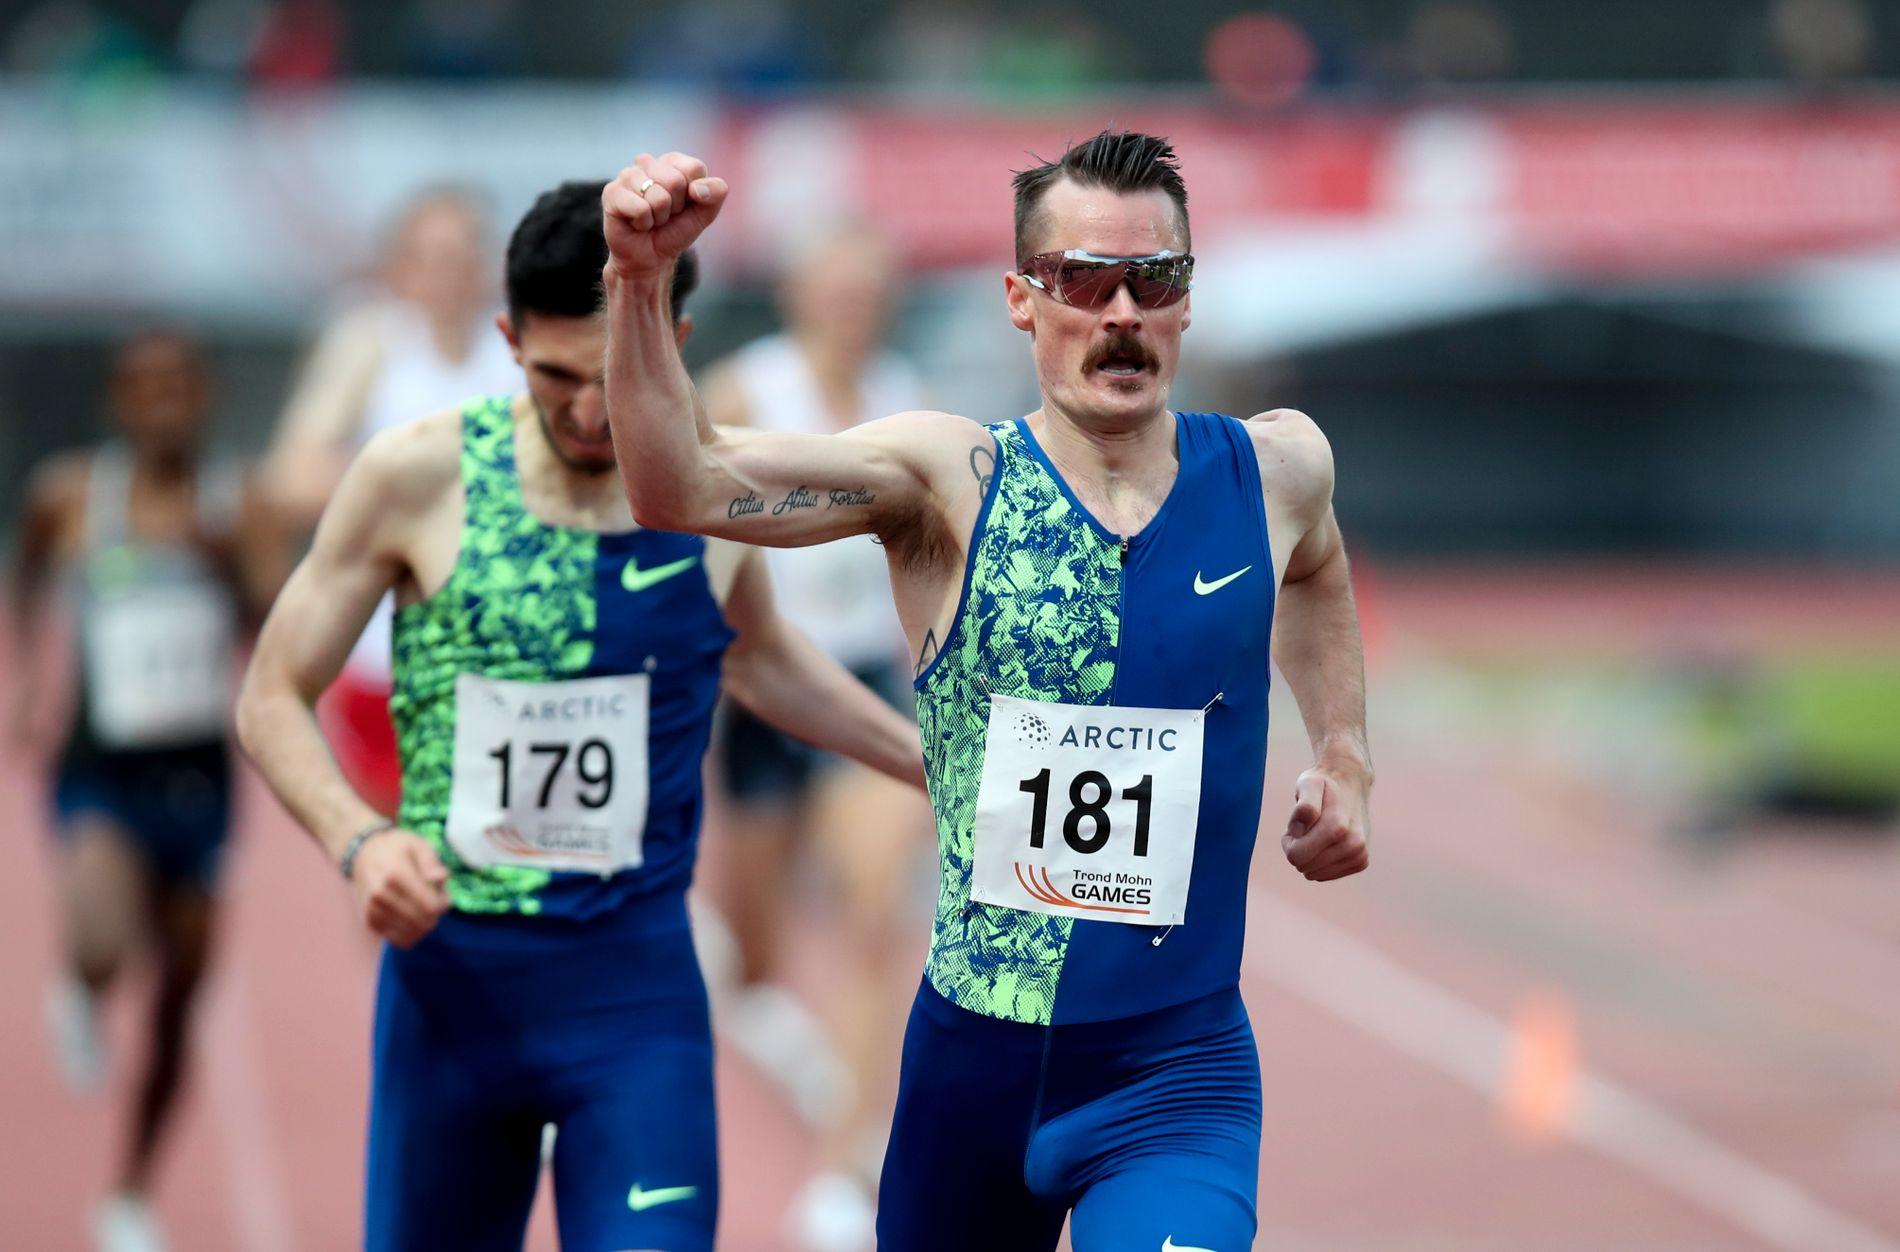 Henrik Ingebrigtsen vant 3000-meteren på Fana stadion i mai på tiden 7.52,74.